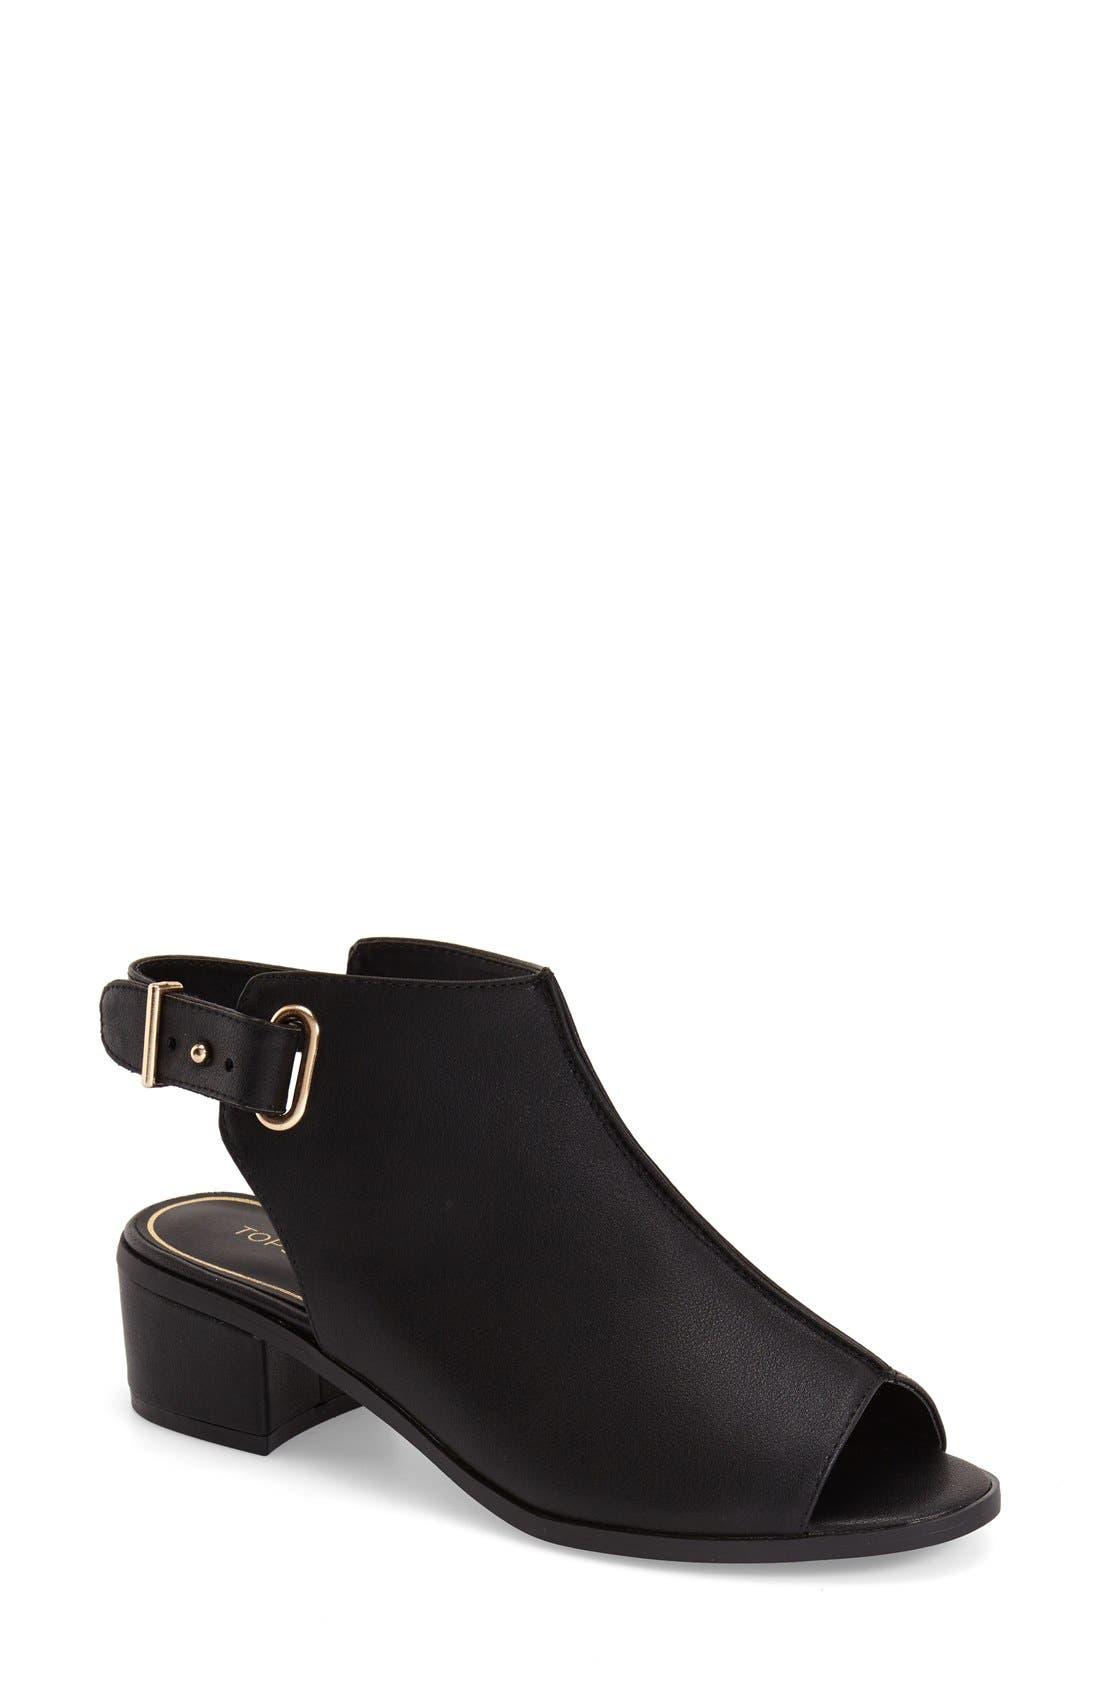 Main Image - Topshop 'Nix' Slingback Block Heel Sandal (Women)